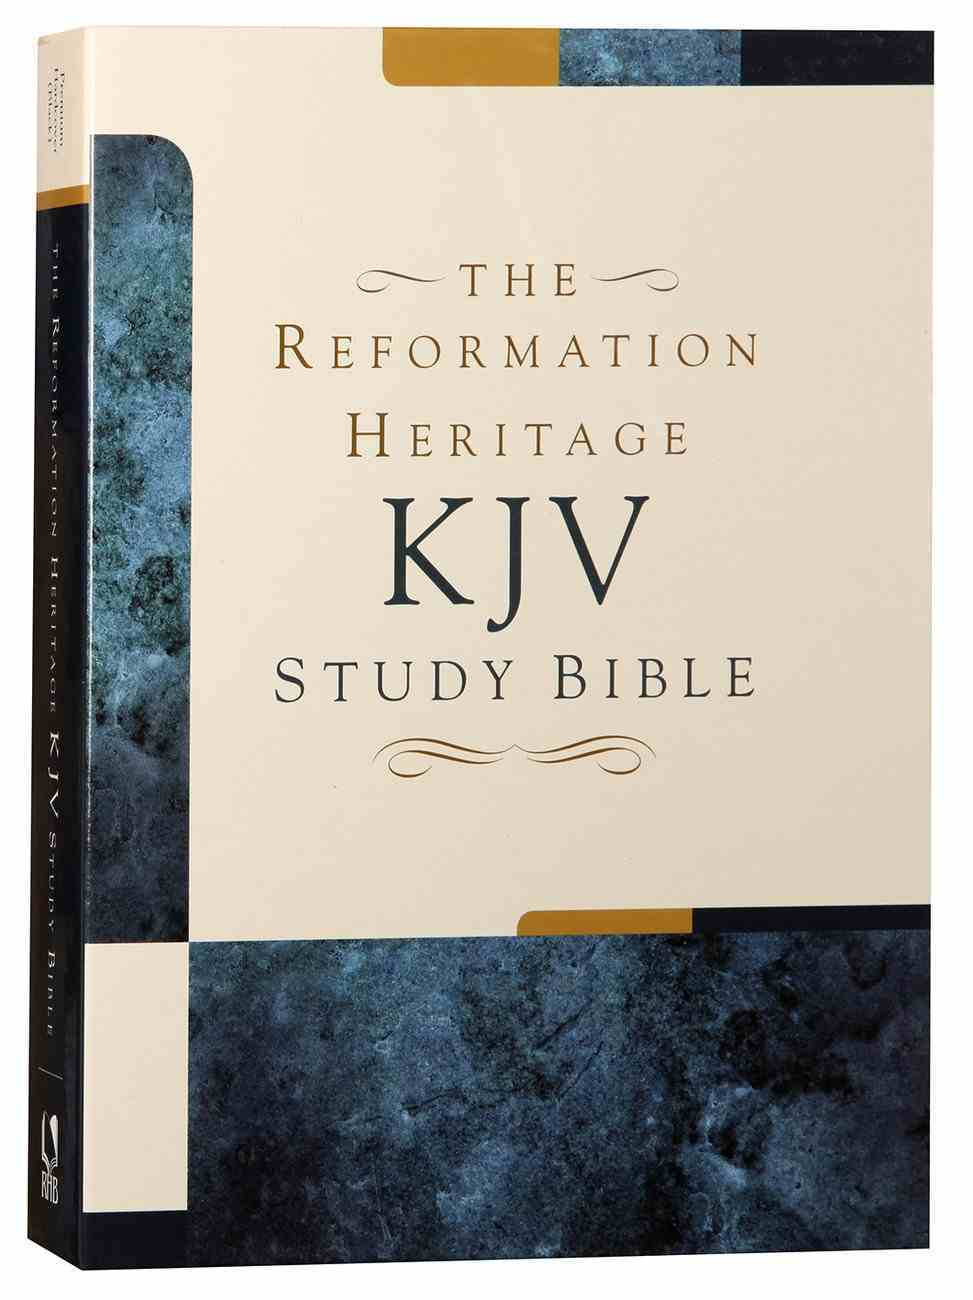 KJV Reformation Heritage Study Bible Premium Hardcover Hardback